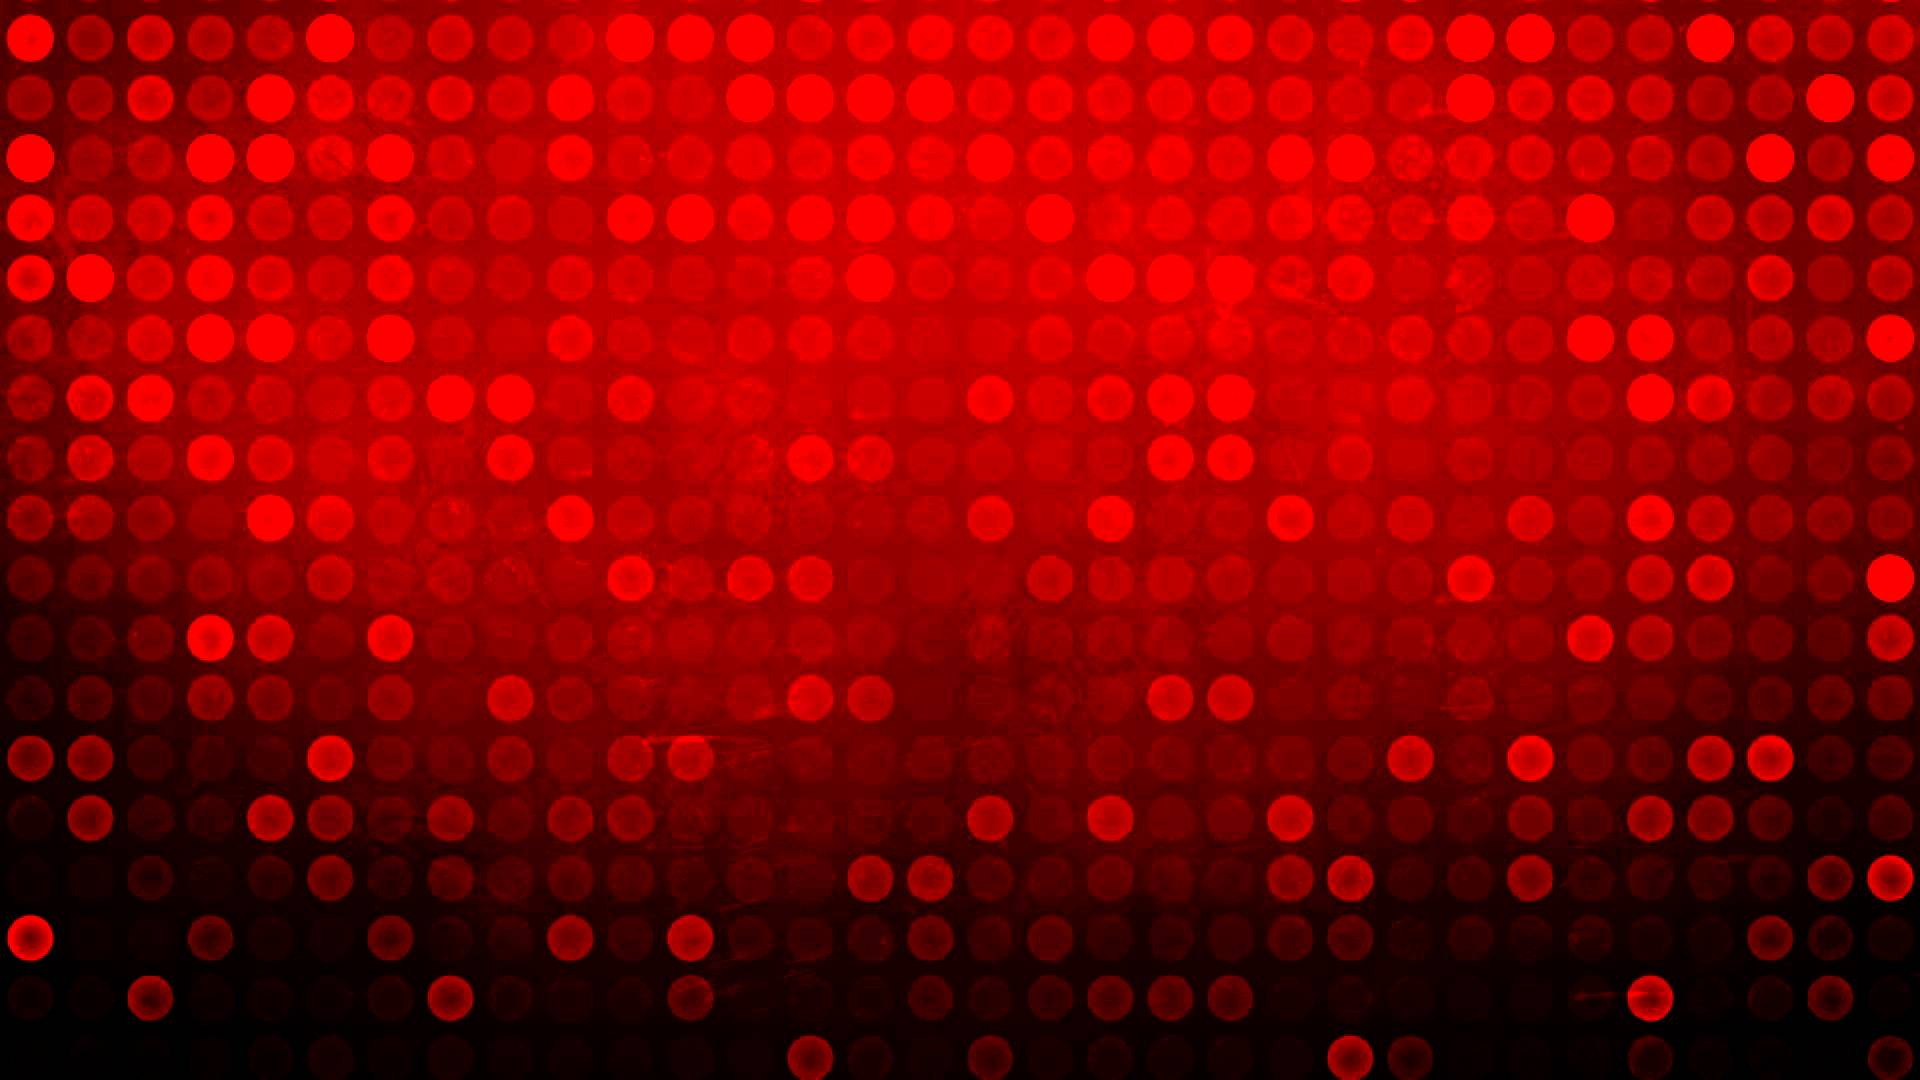 Red Wallpaper PC Desktop #6373 Wallpaper | Cool Walldiskpaper.com